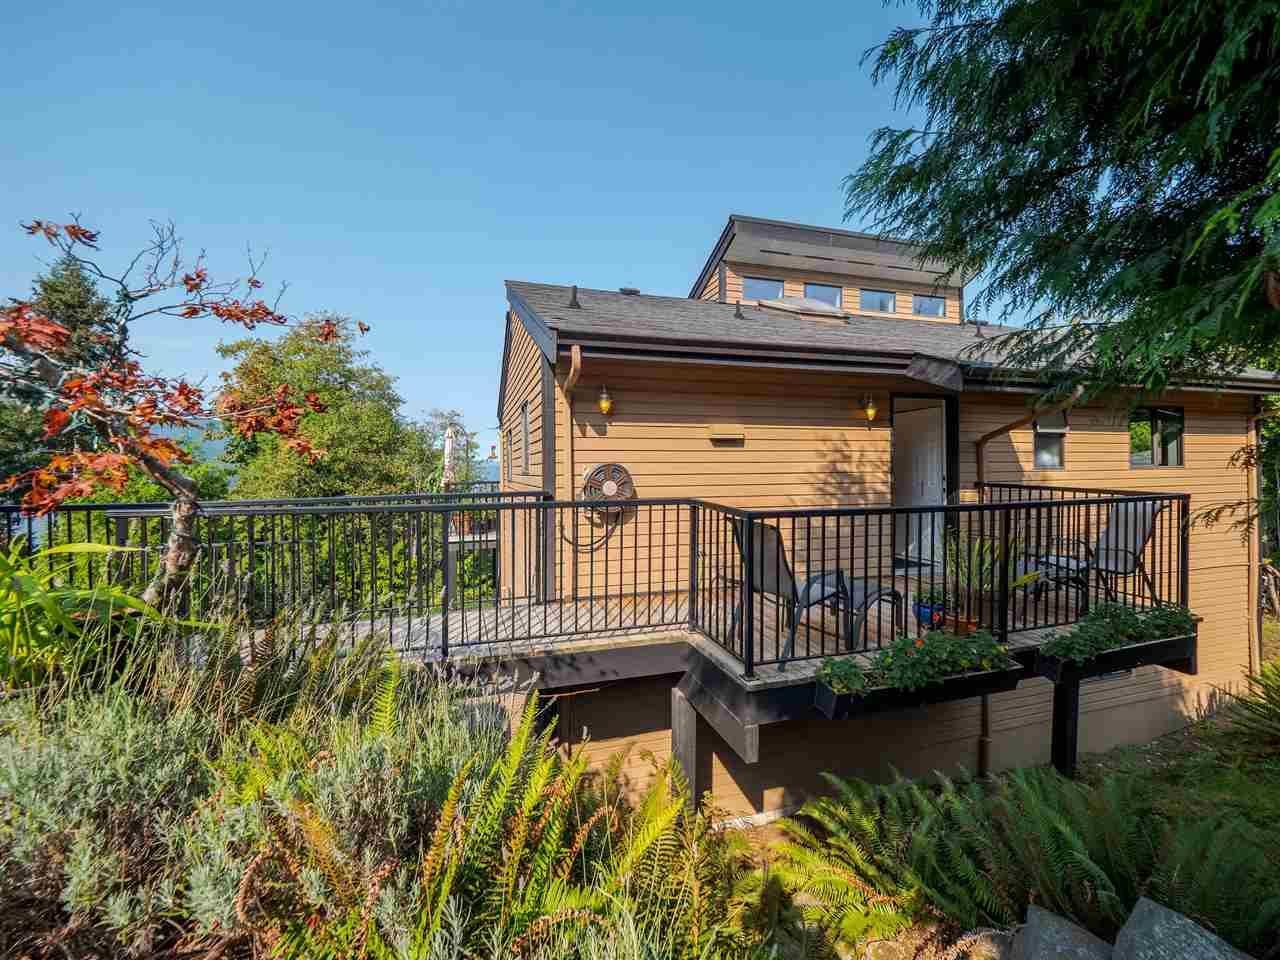 Main Photo: 5852 SKOOKUMCHUK Road in Sechelt: Sechelt District House for sale (Sunshine Coast)  : MLS®# R2504448